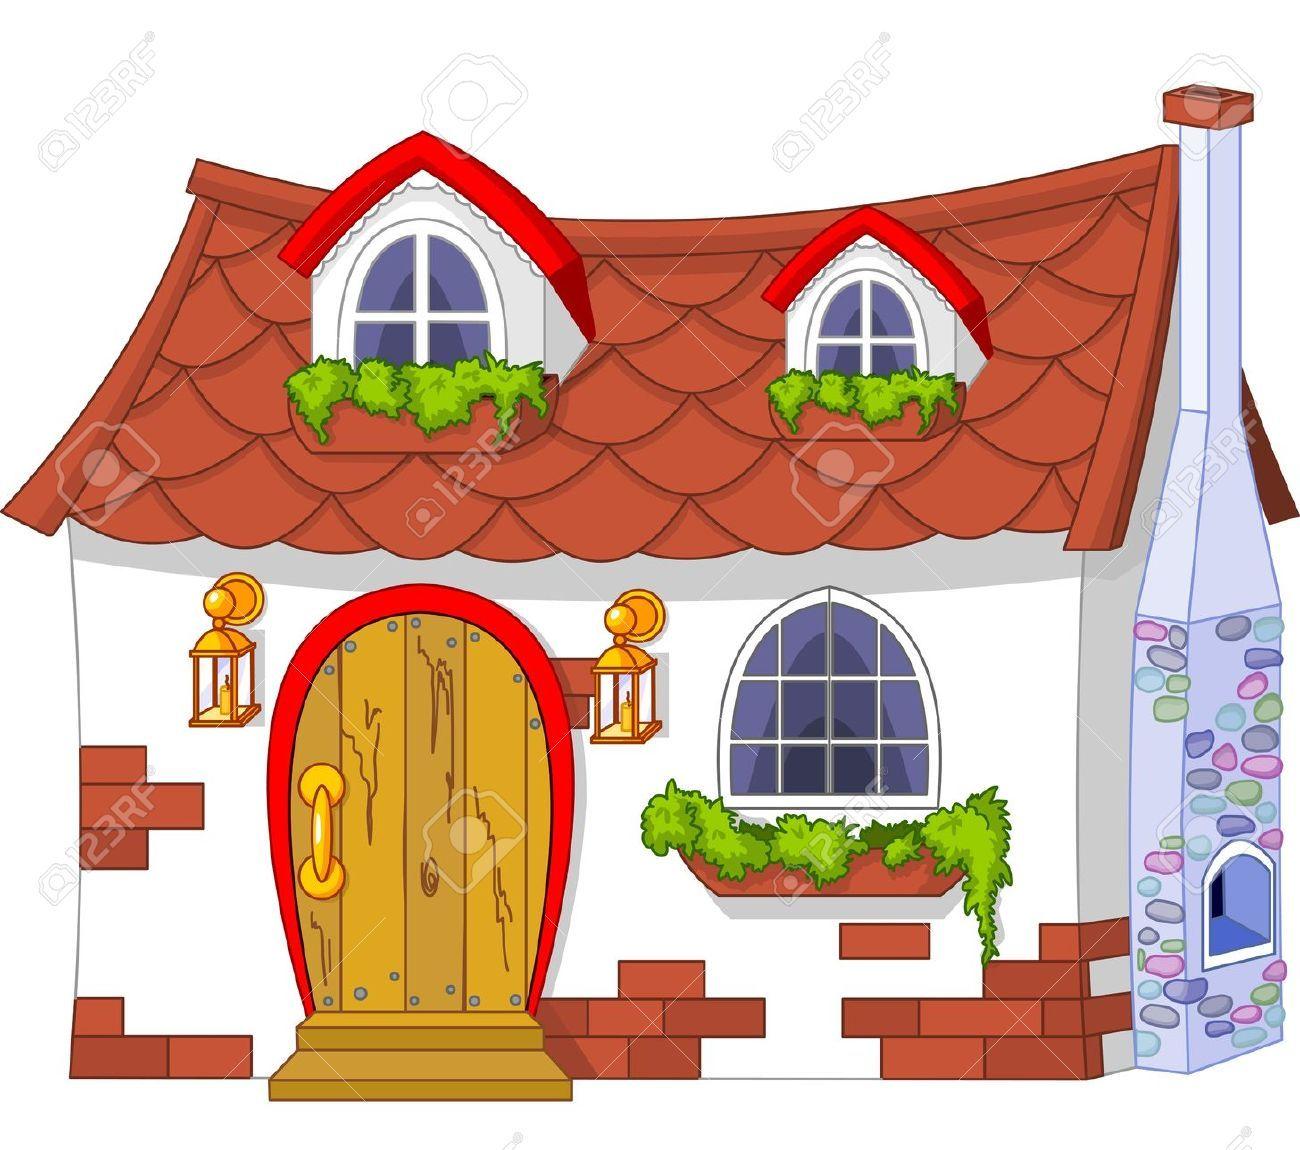 Illustration Of A Cute Little House Cute Little Houses Cute House Cartoon House